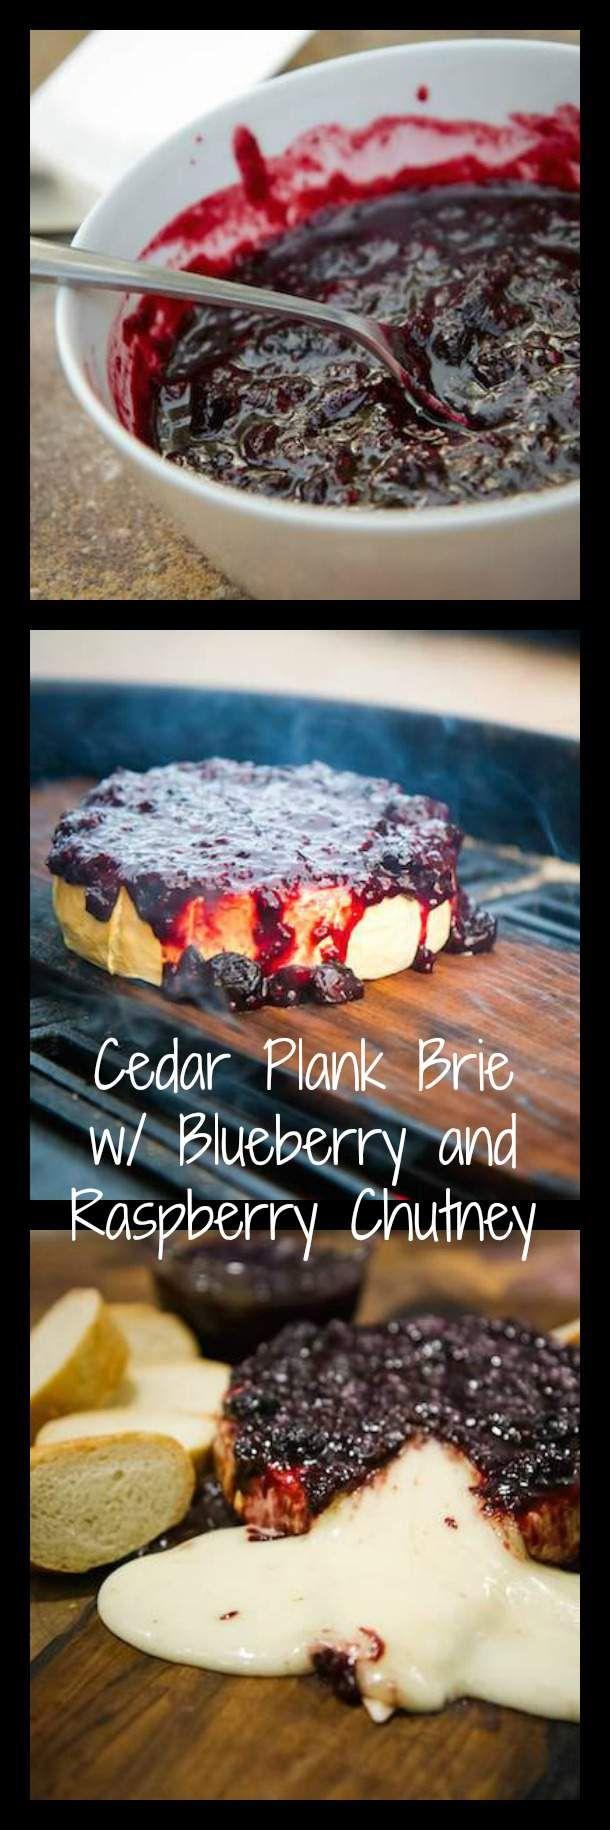 Cedar Plank Brie with Blueberry Raspberry Chutney Recipe